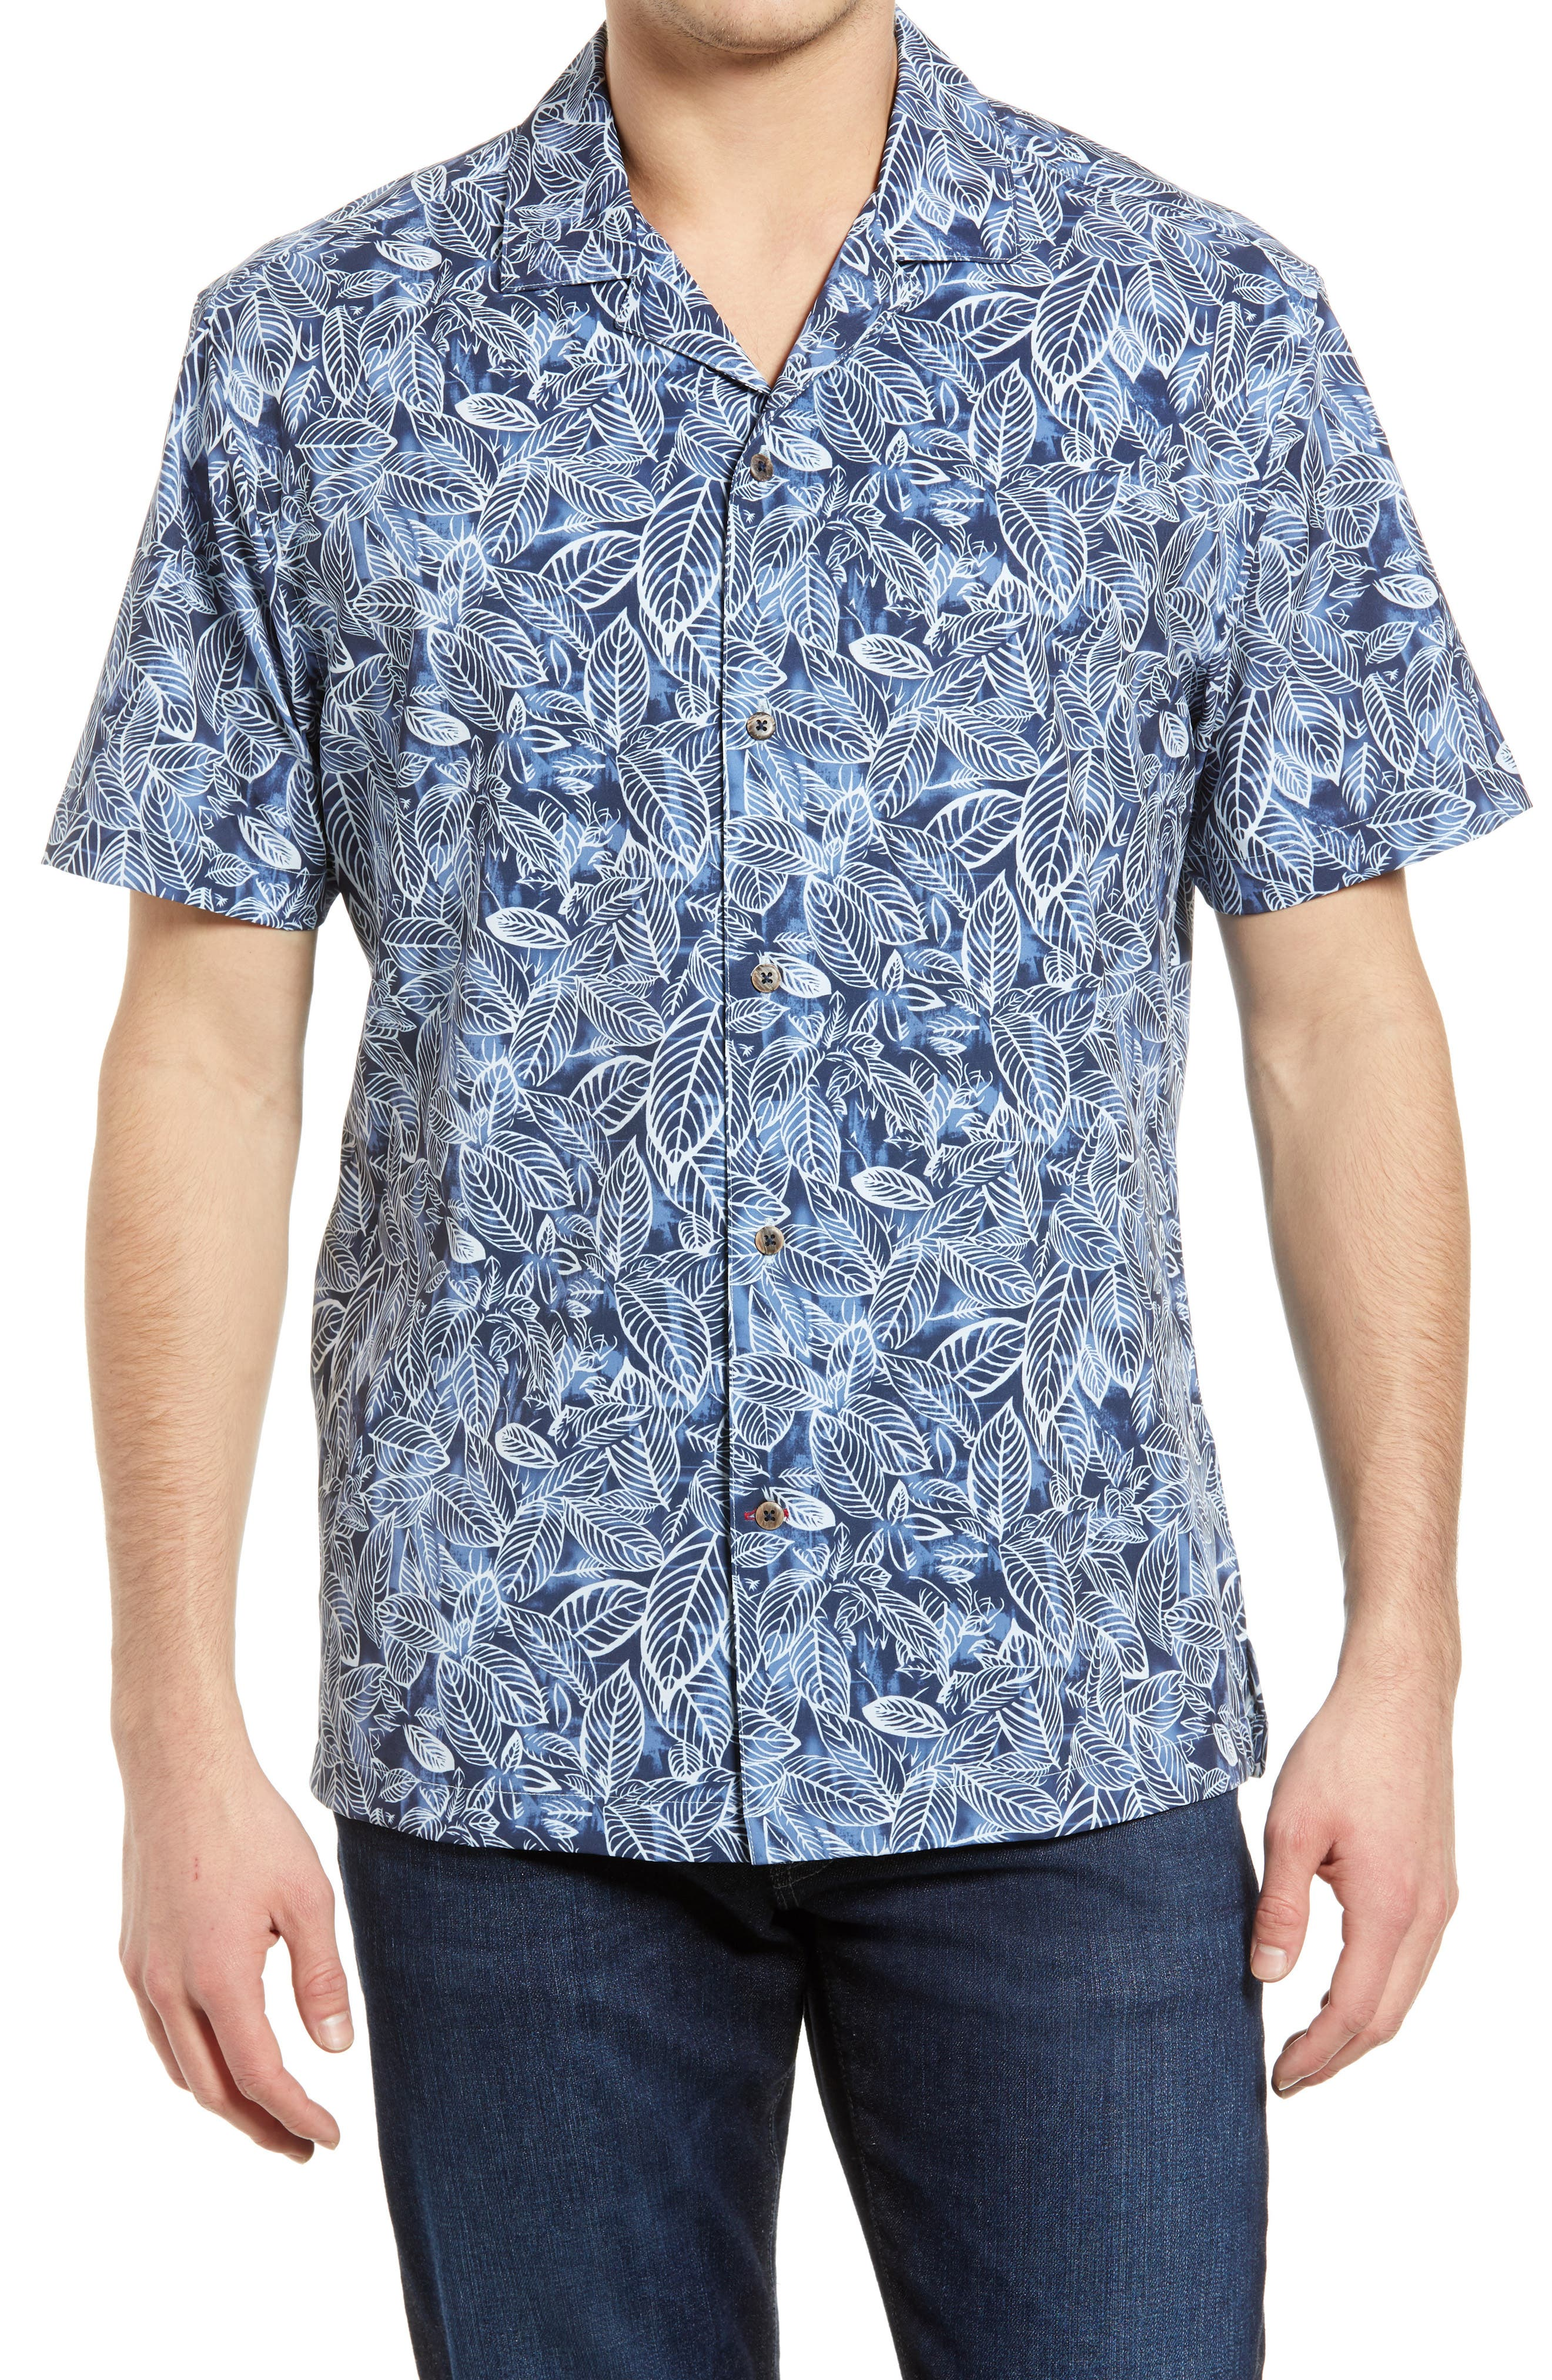 Palm Performance Short Sleeve Button-Up Camp Shirt